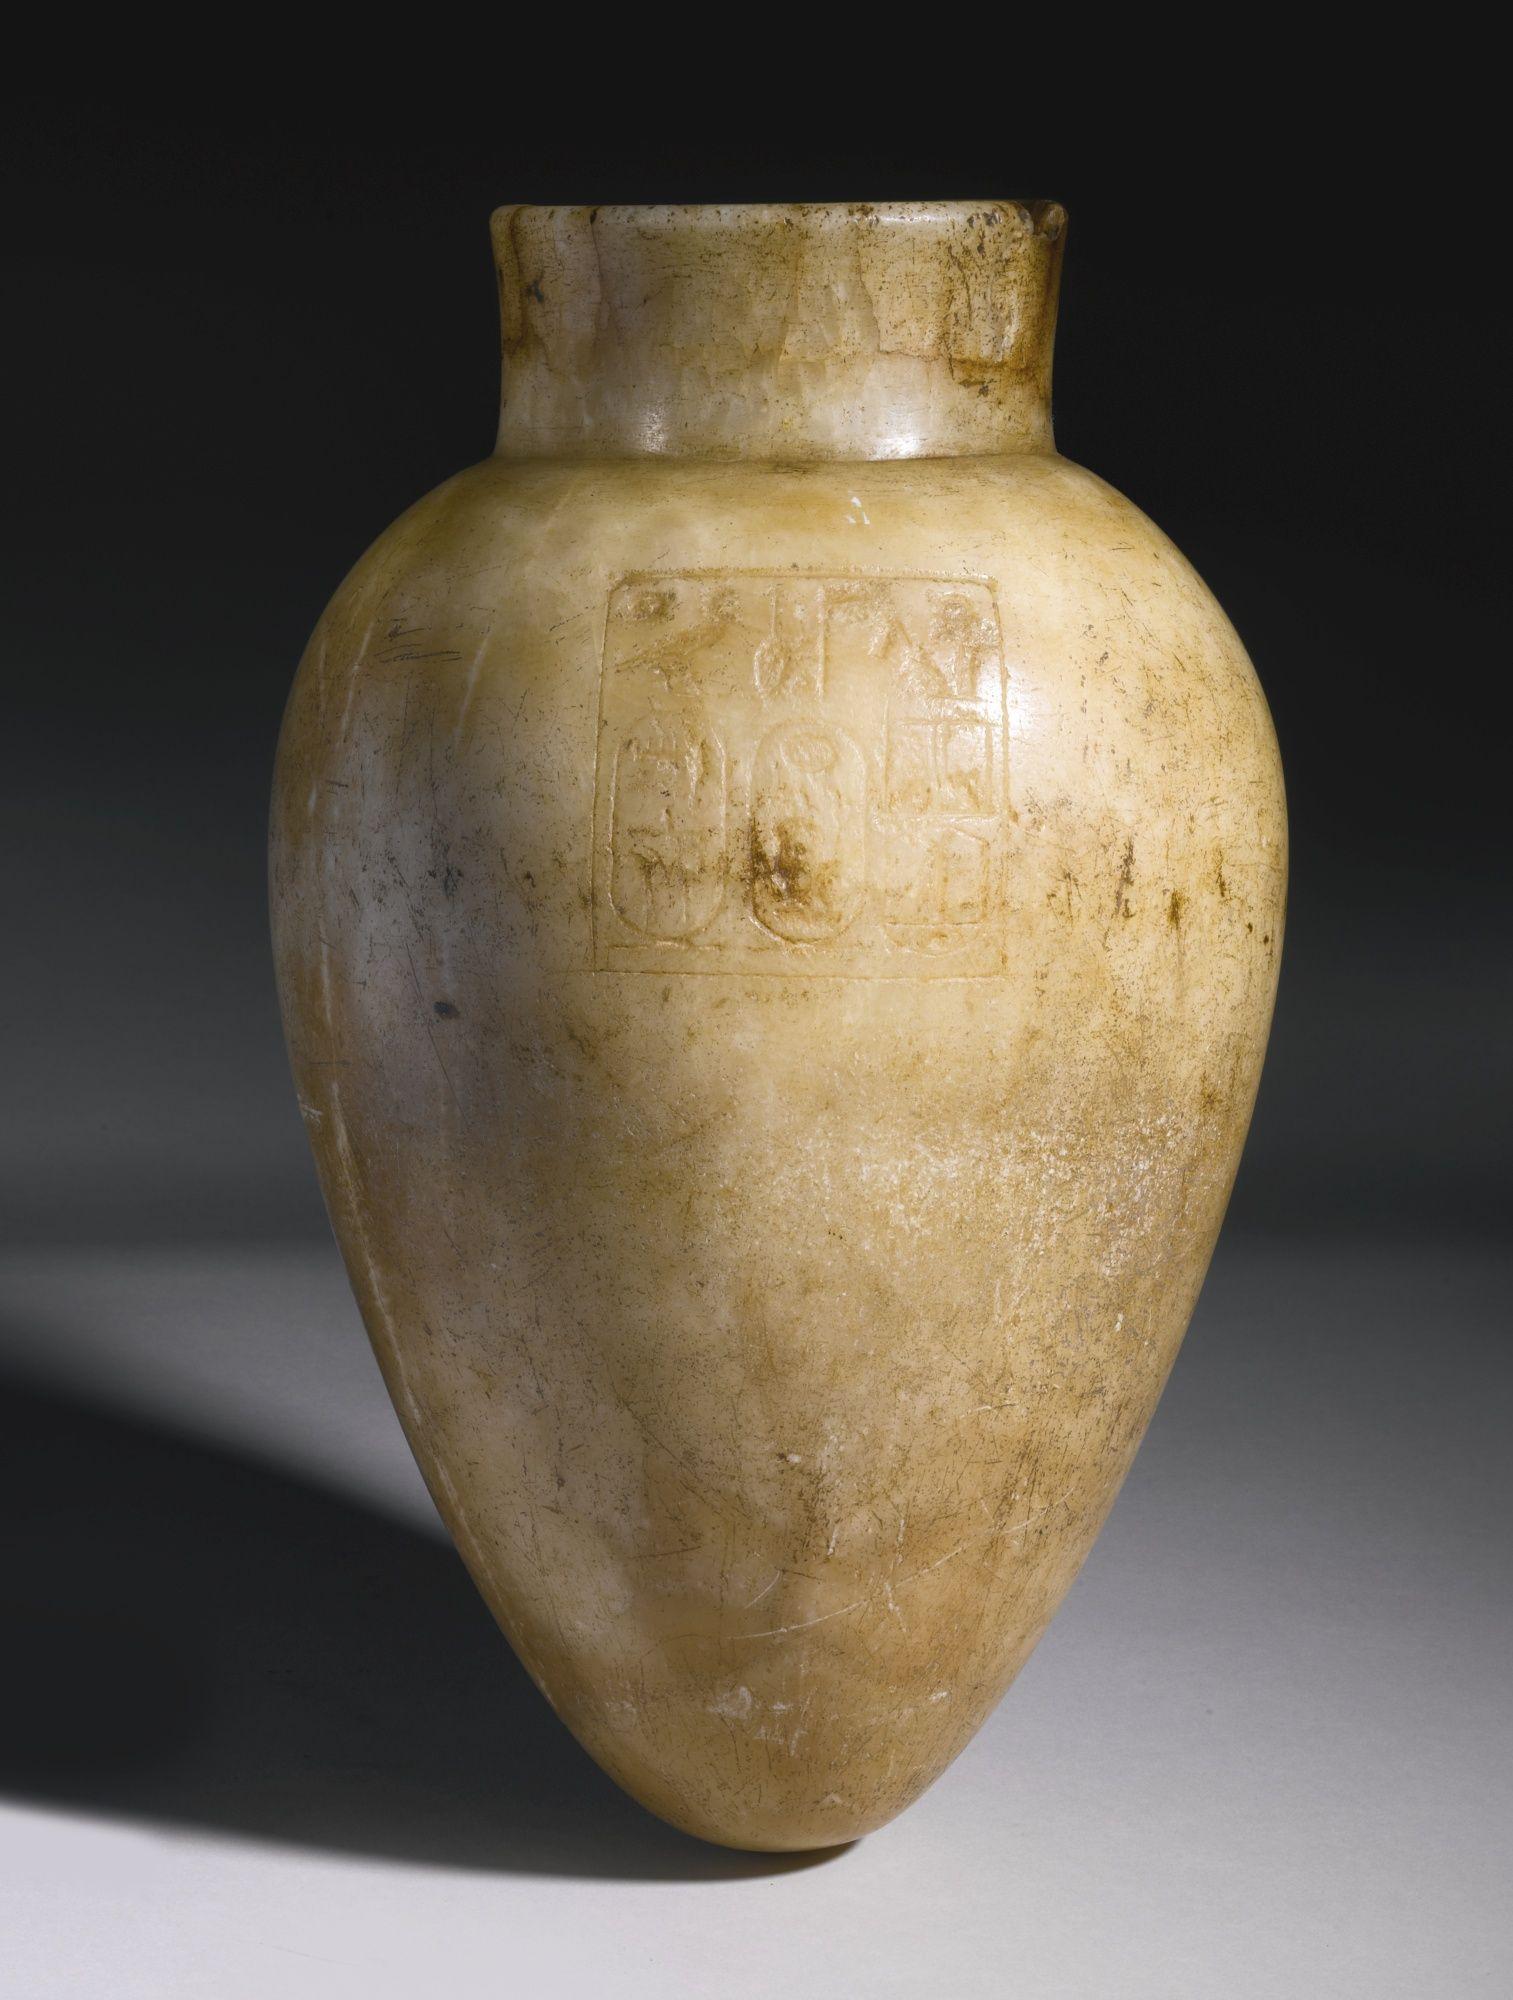 An Egyptian Alabaster Jar 18th Dynasty Reign Of Amenhotep Iii